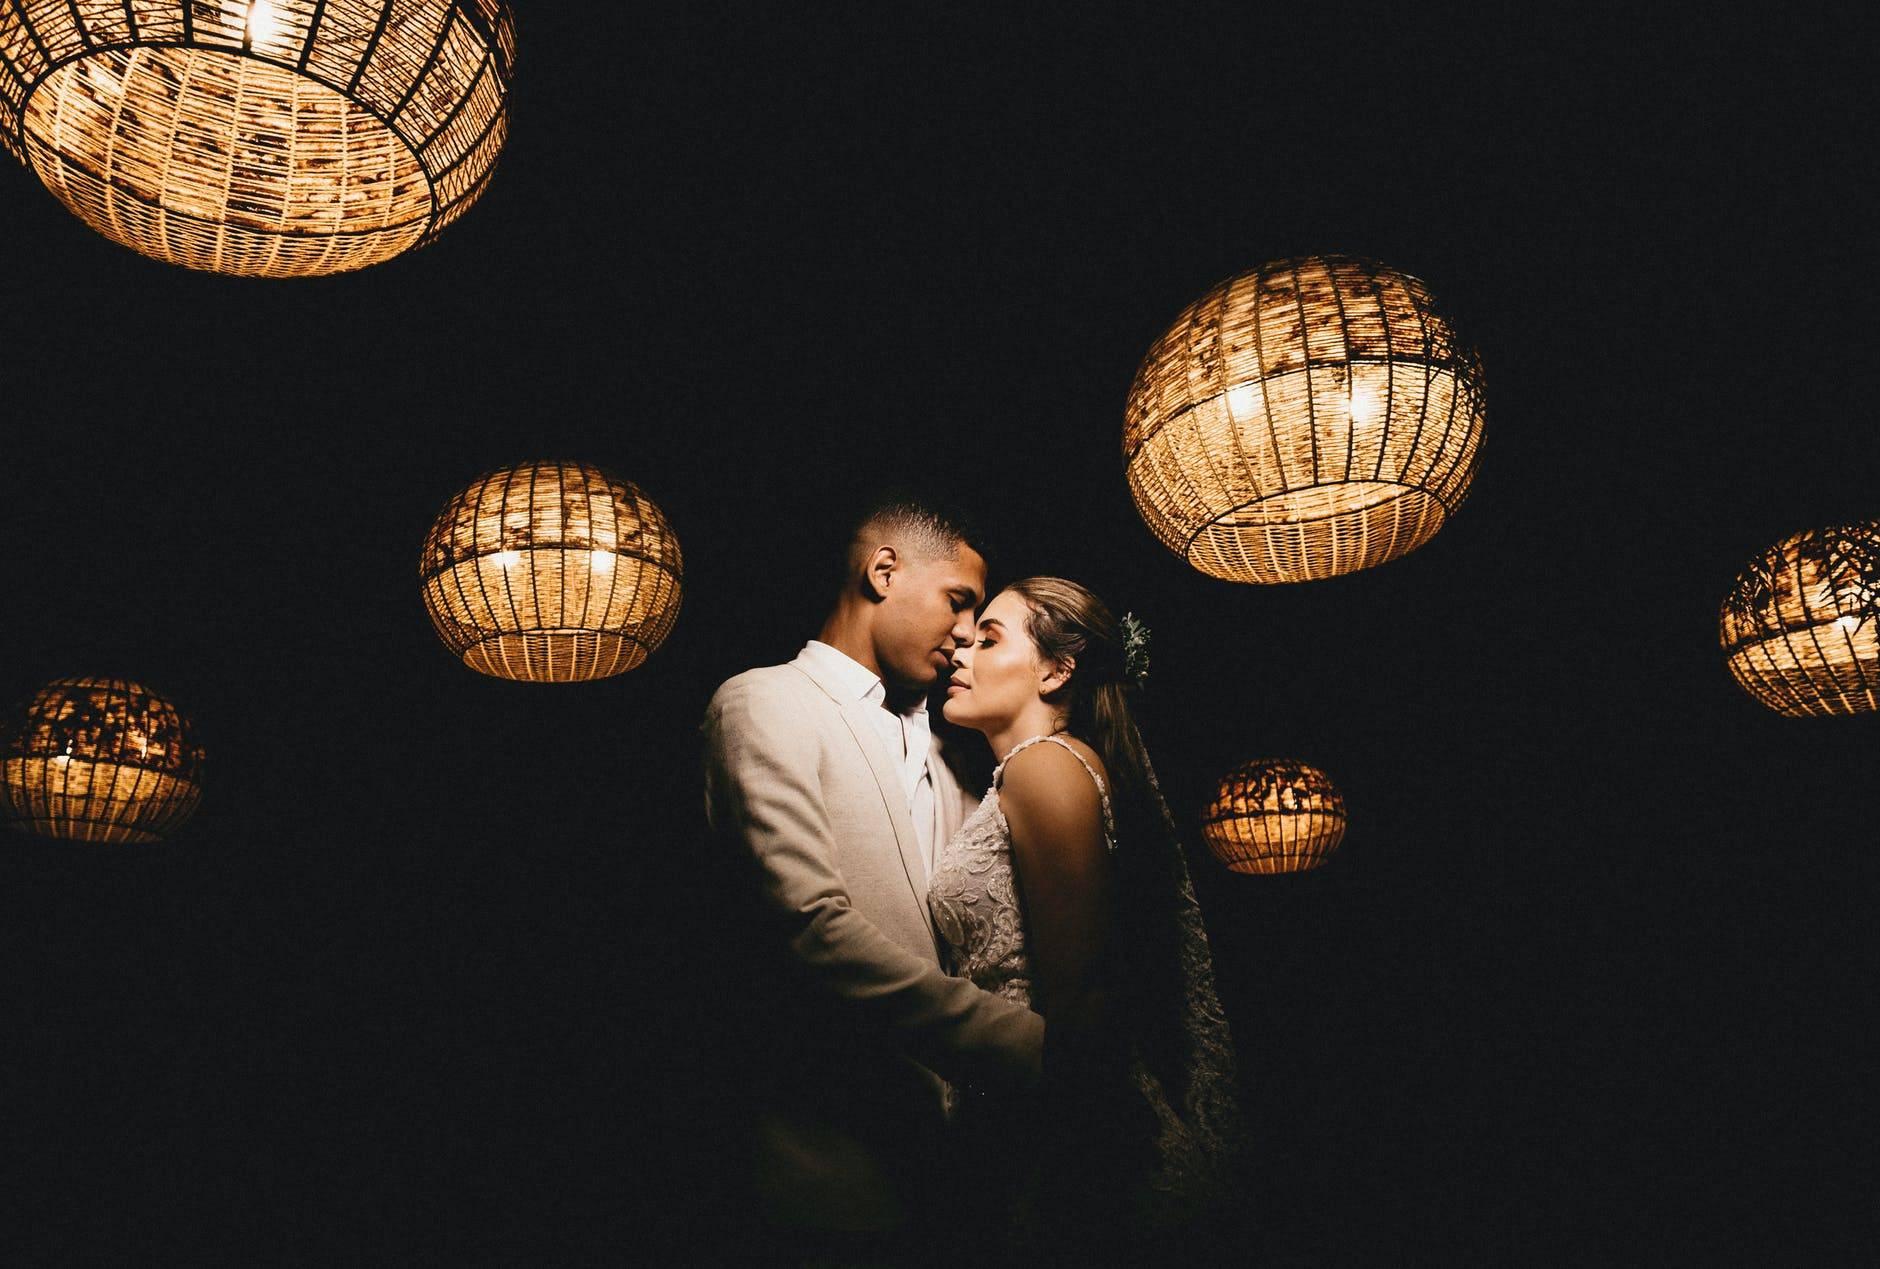 loving ethnic newlyweds hugging in dark studio